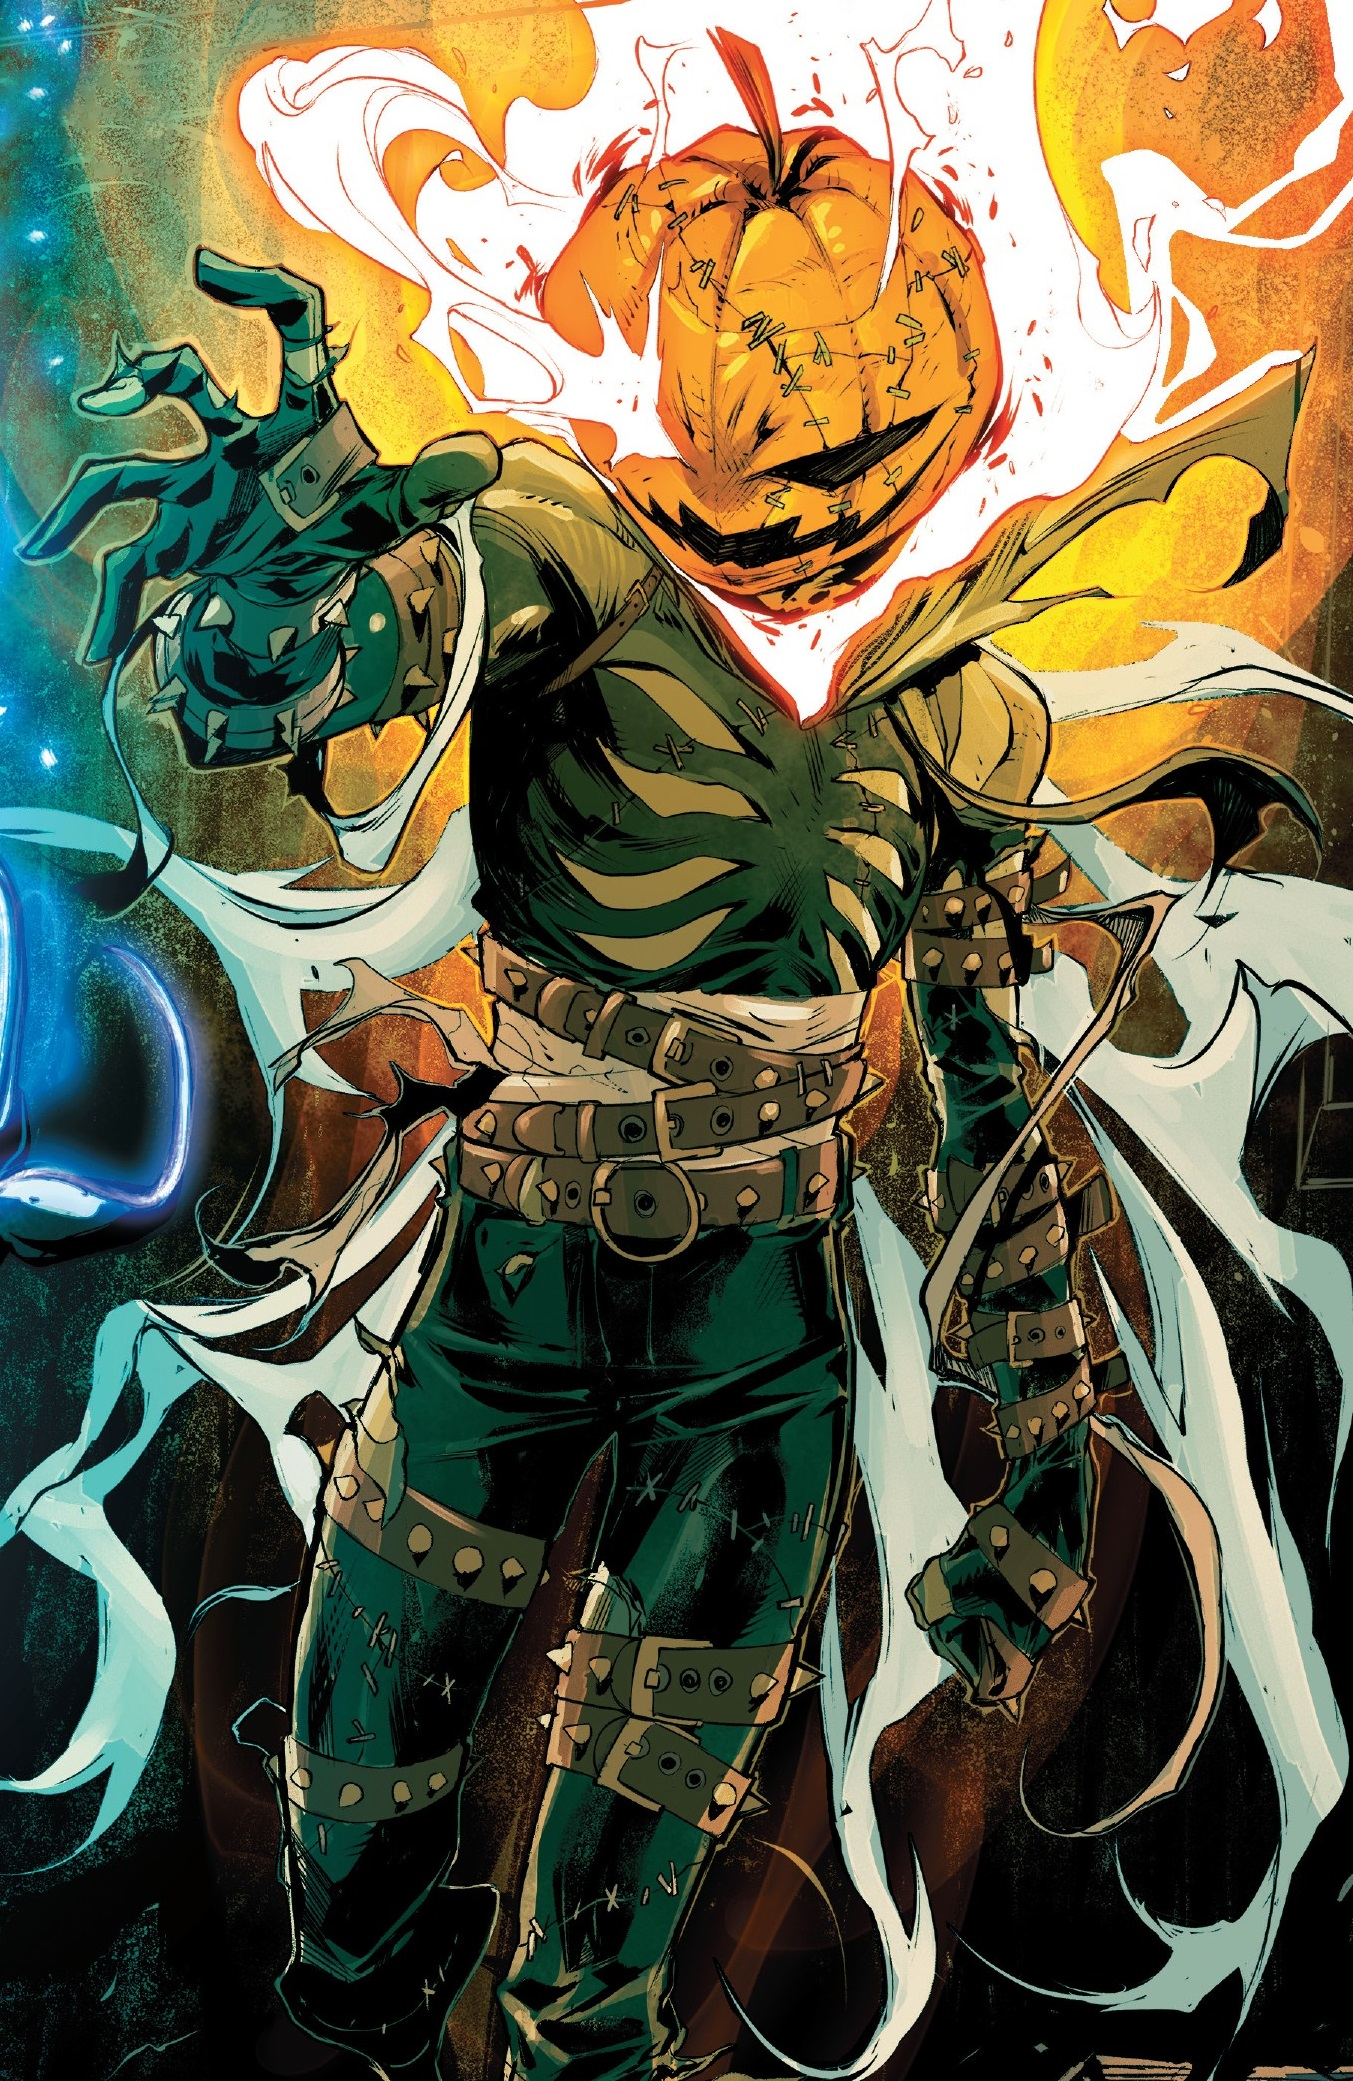 Jack O'Lantern (Impostor II) (Earth-616)